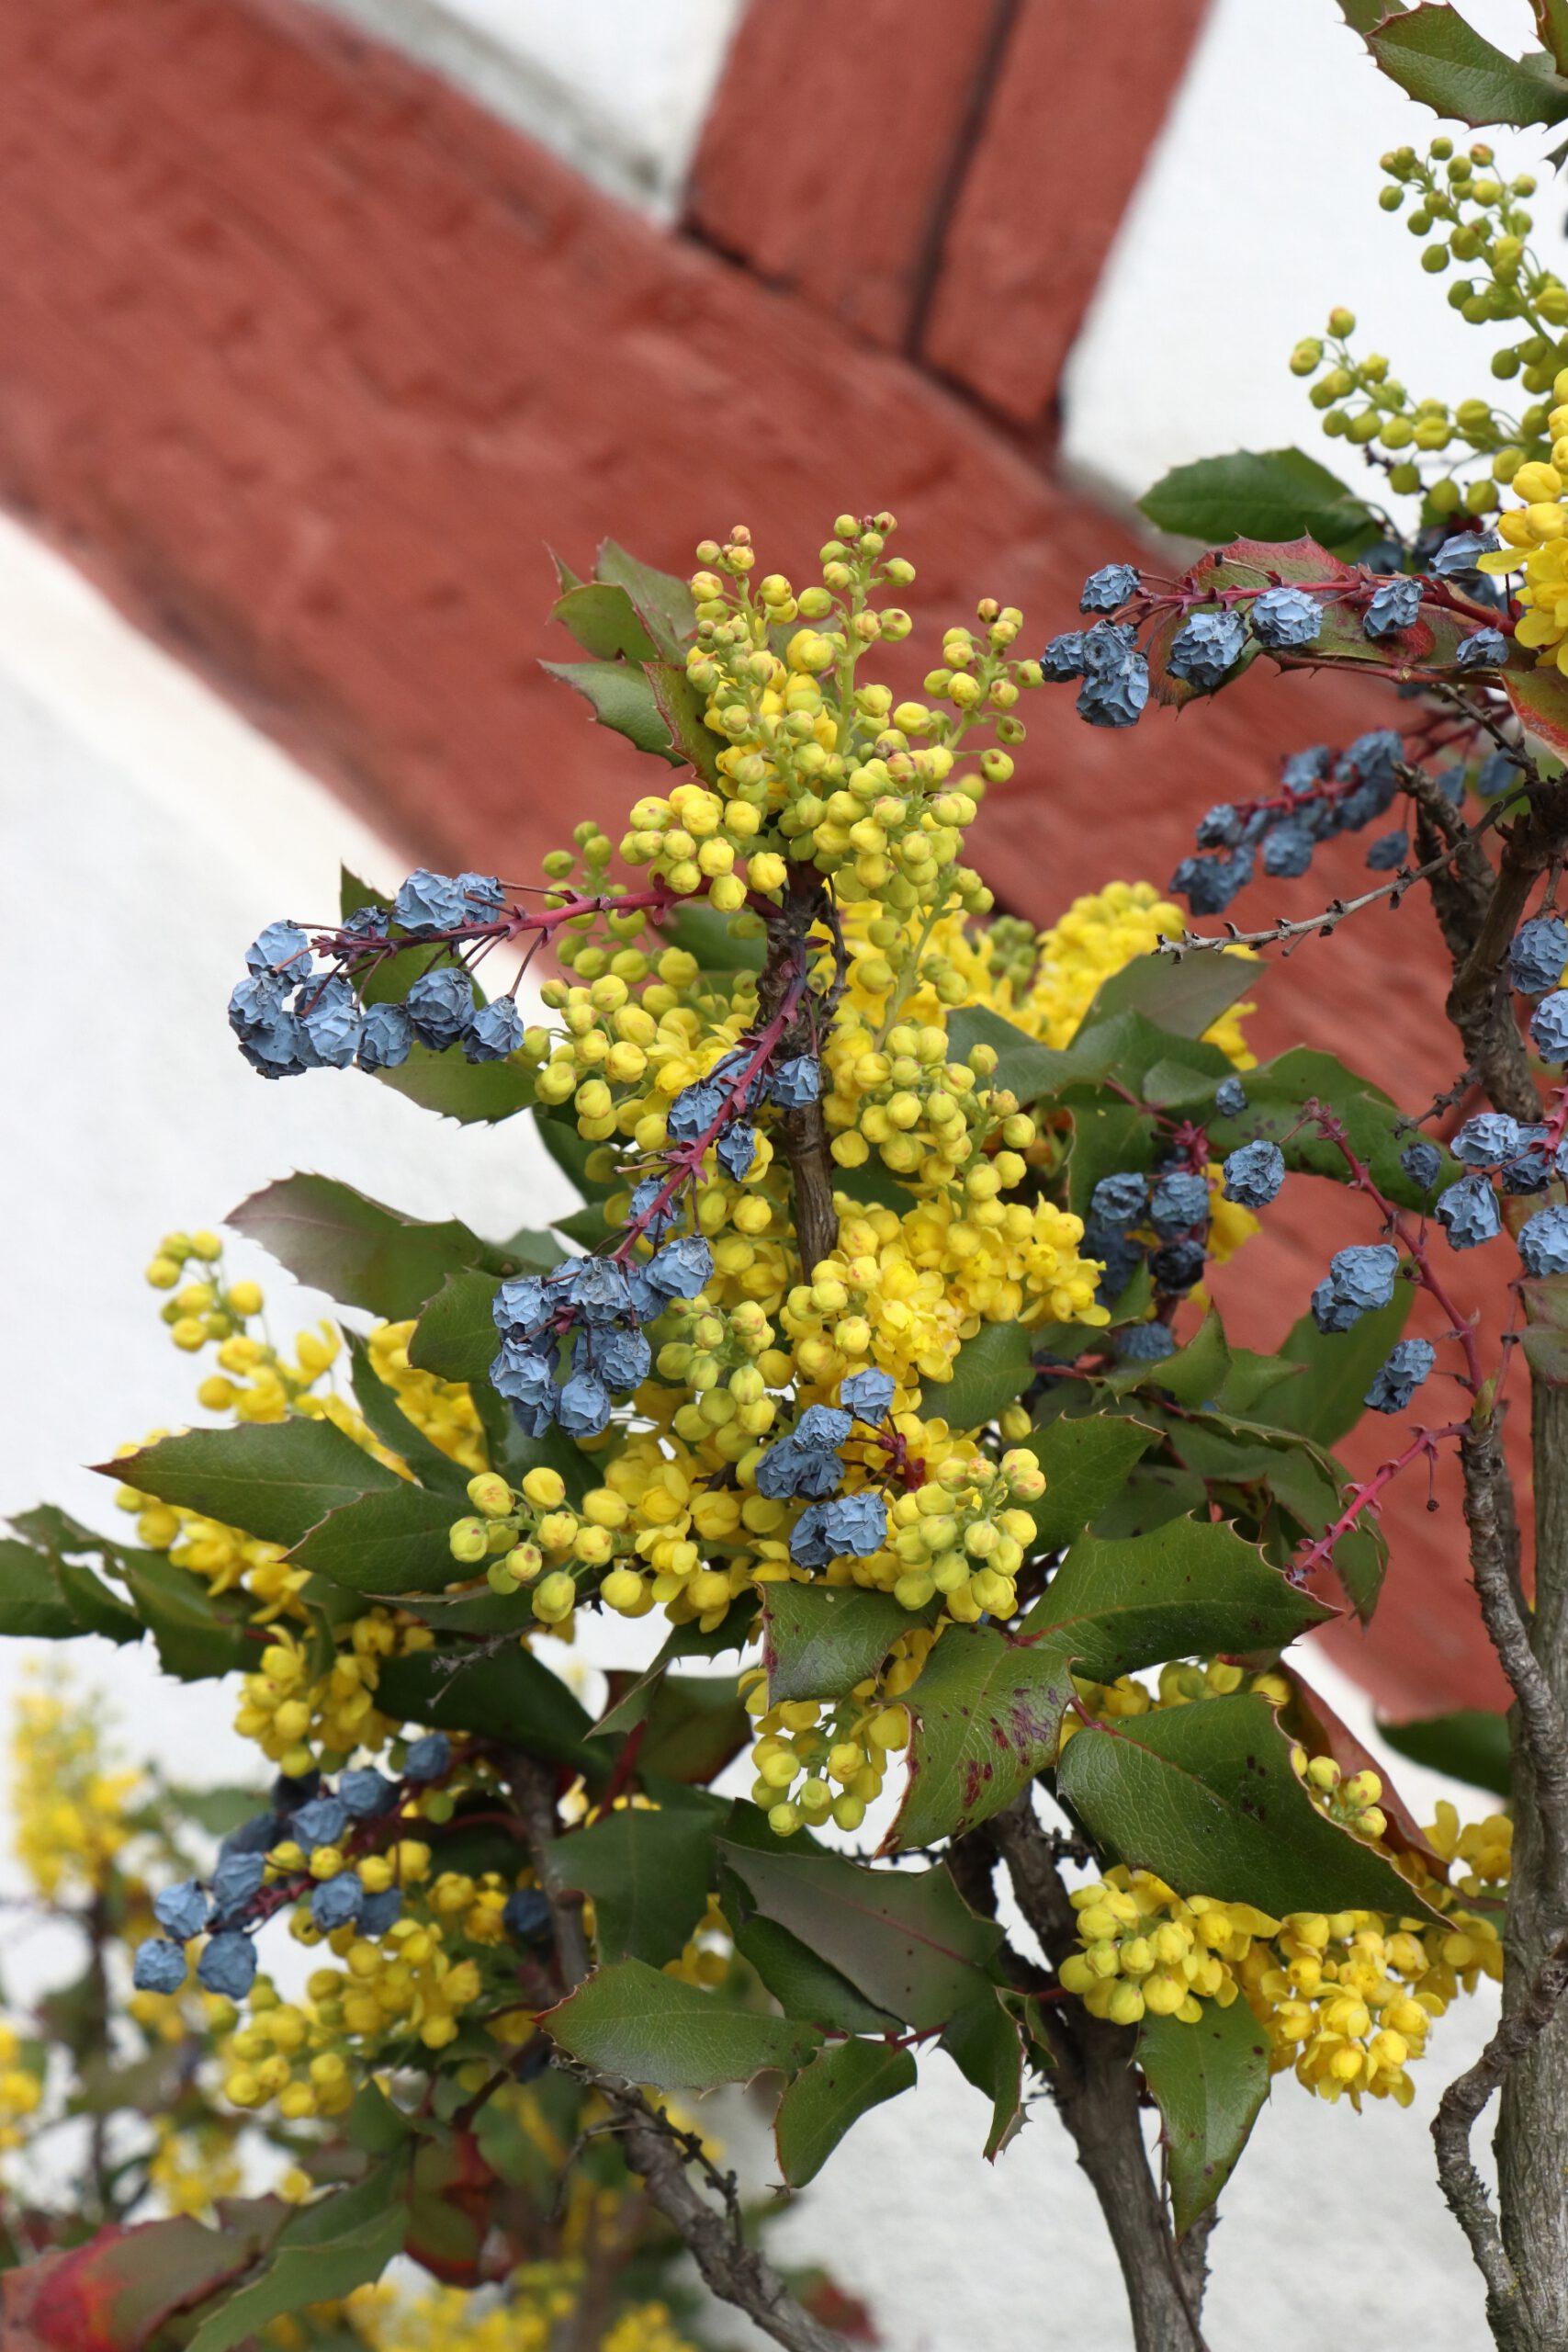 Mahonienblüte mit altem Fruchtstand